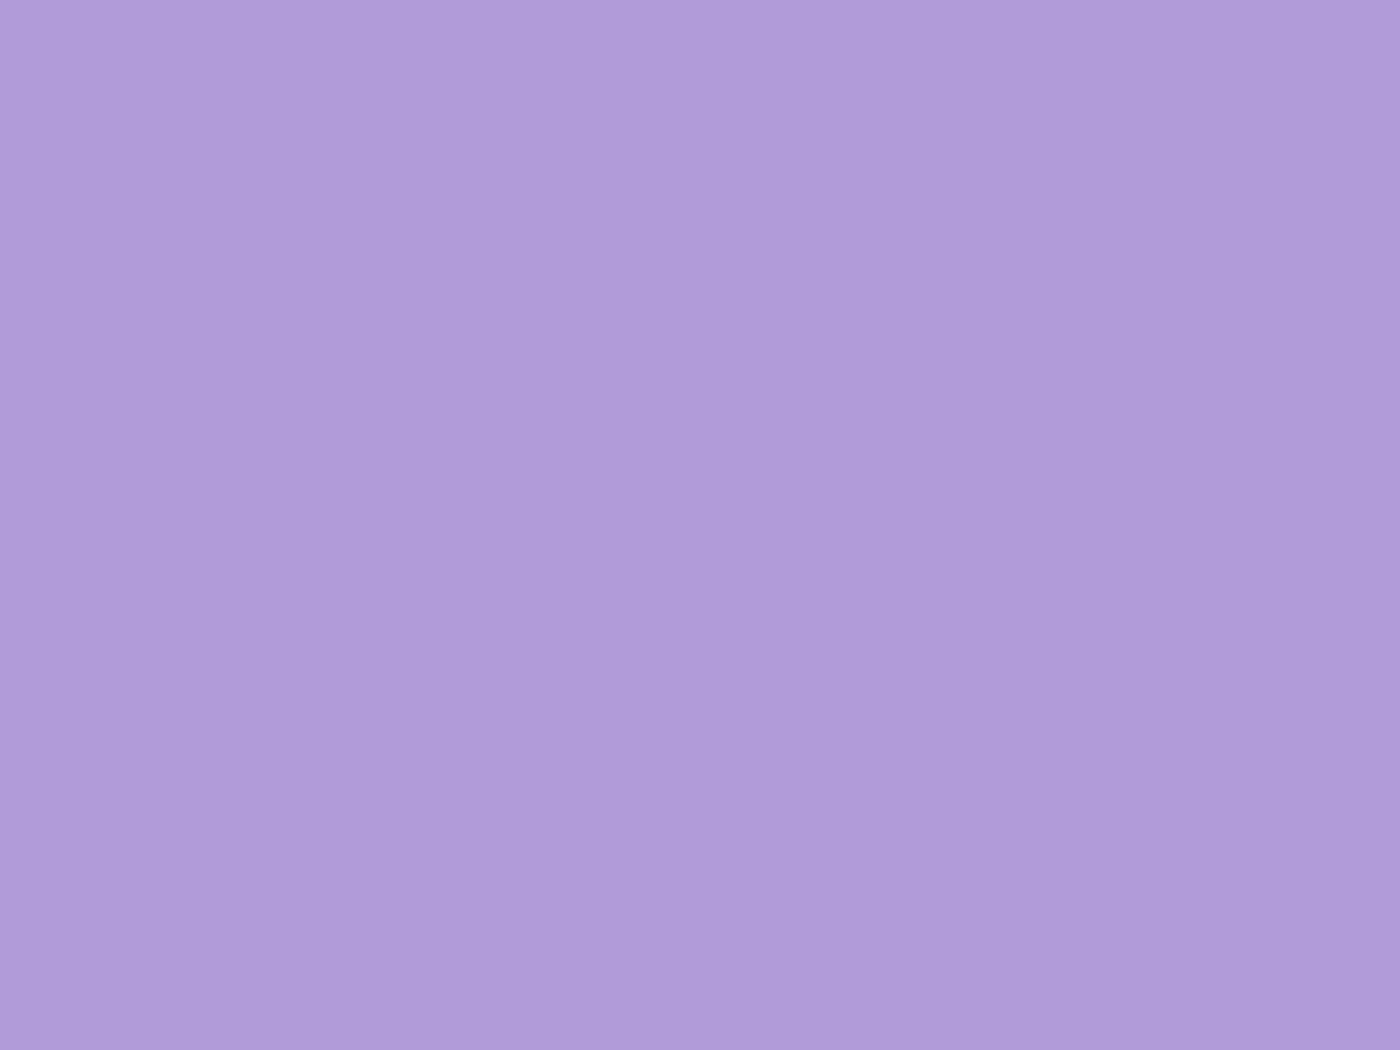 1400x1050 Light Pastel Purple Solid Color Background